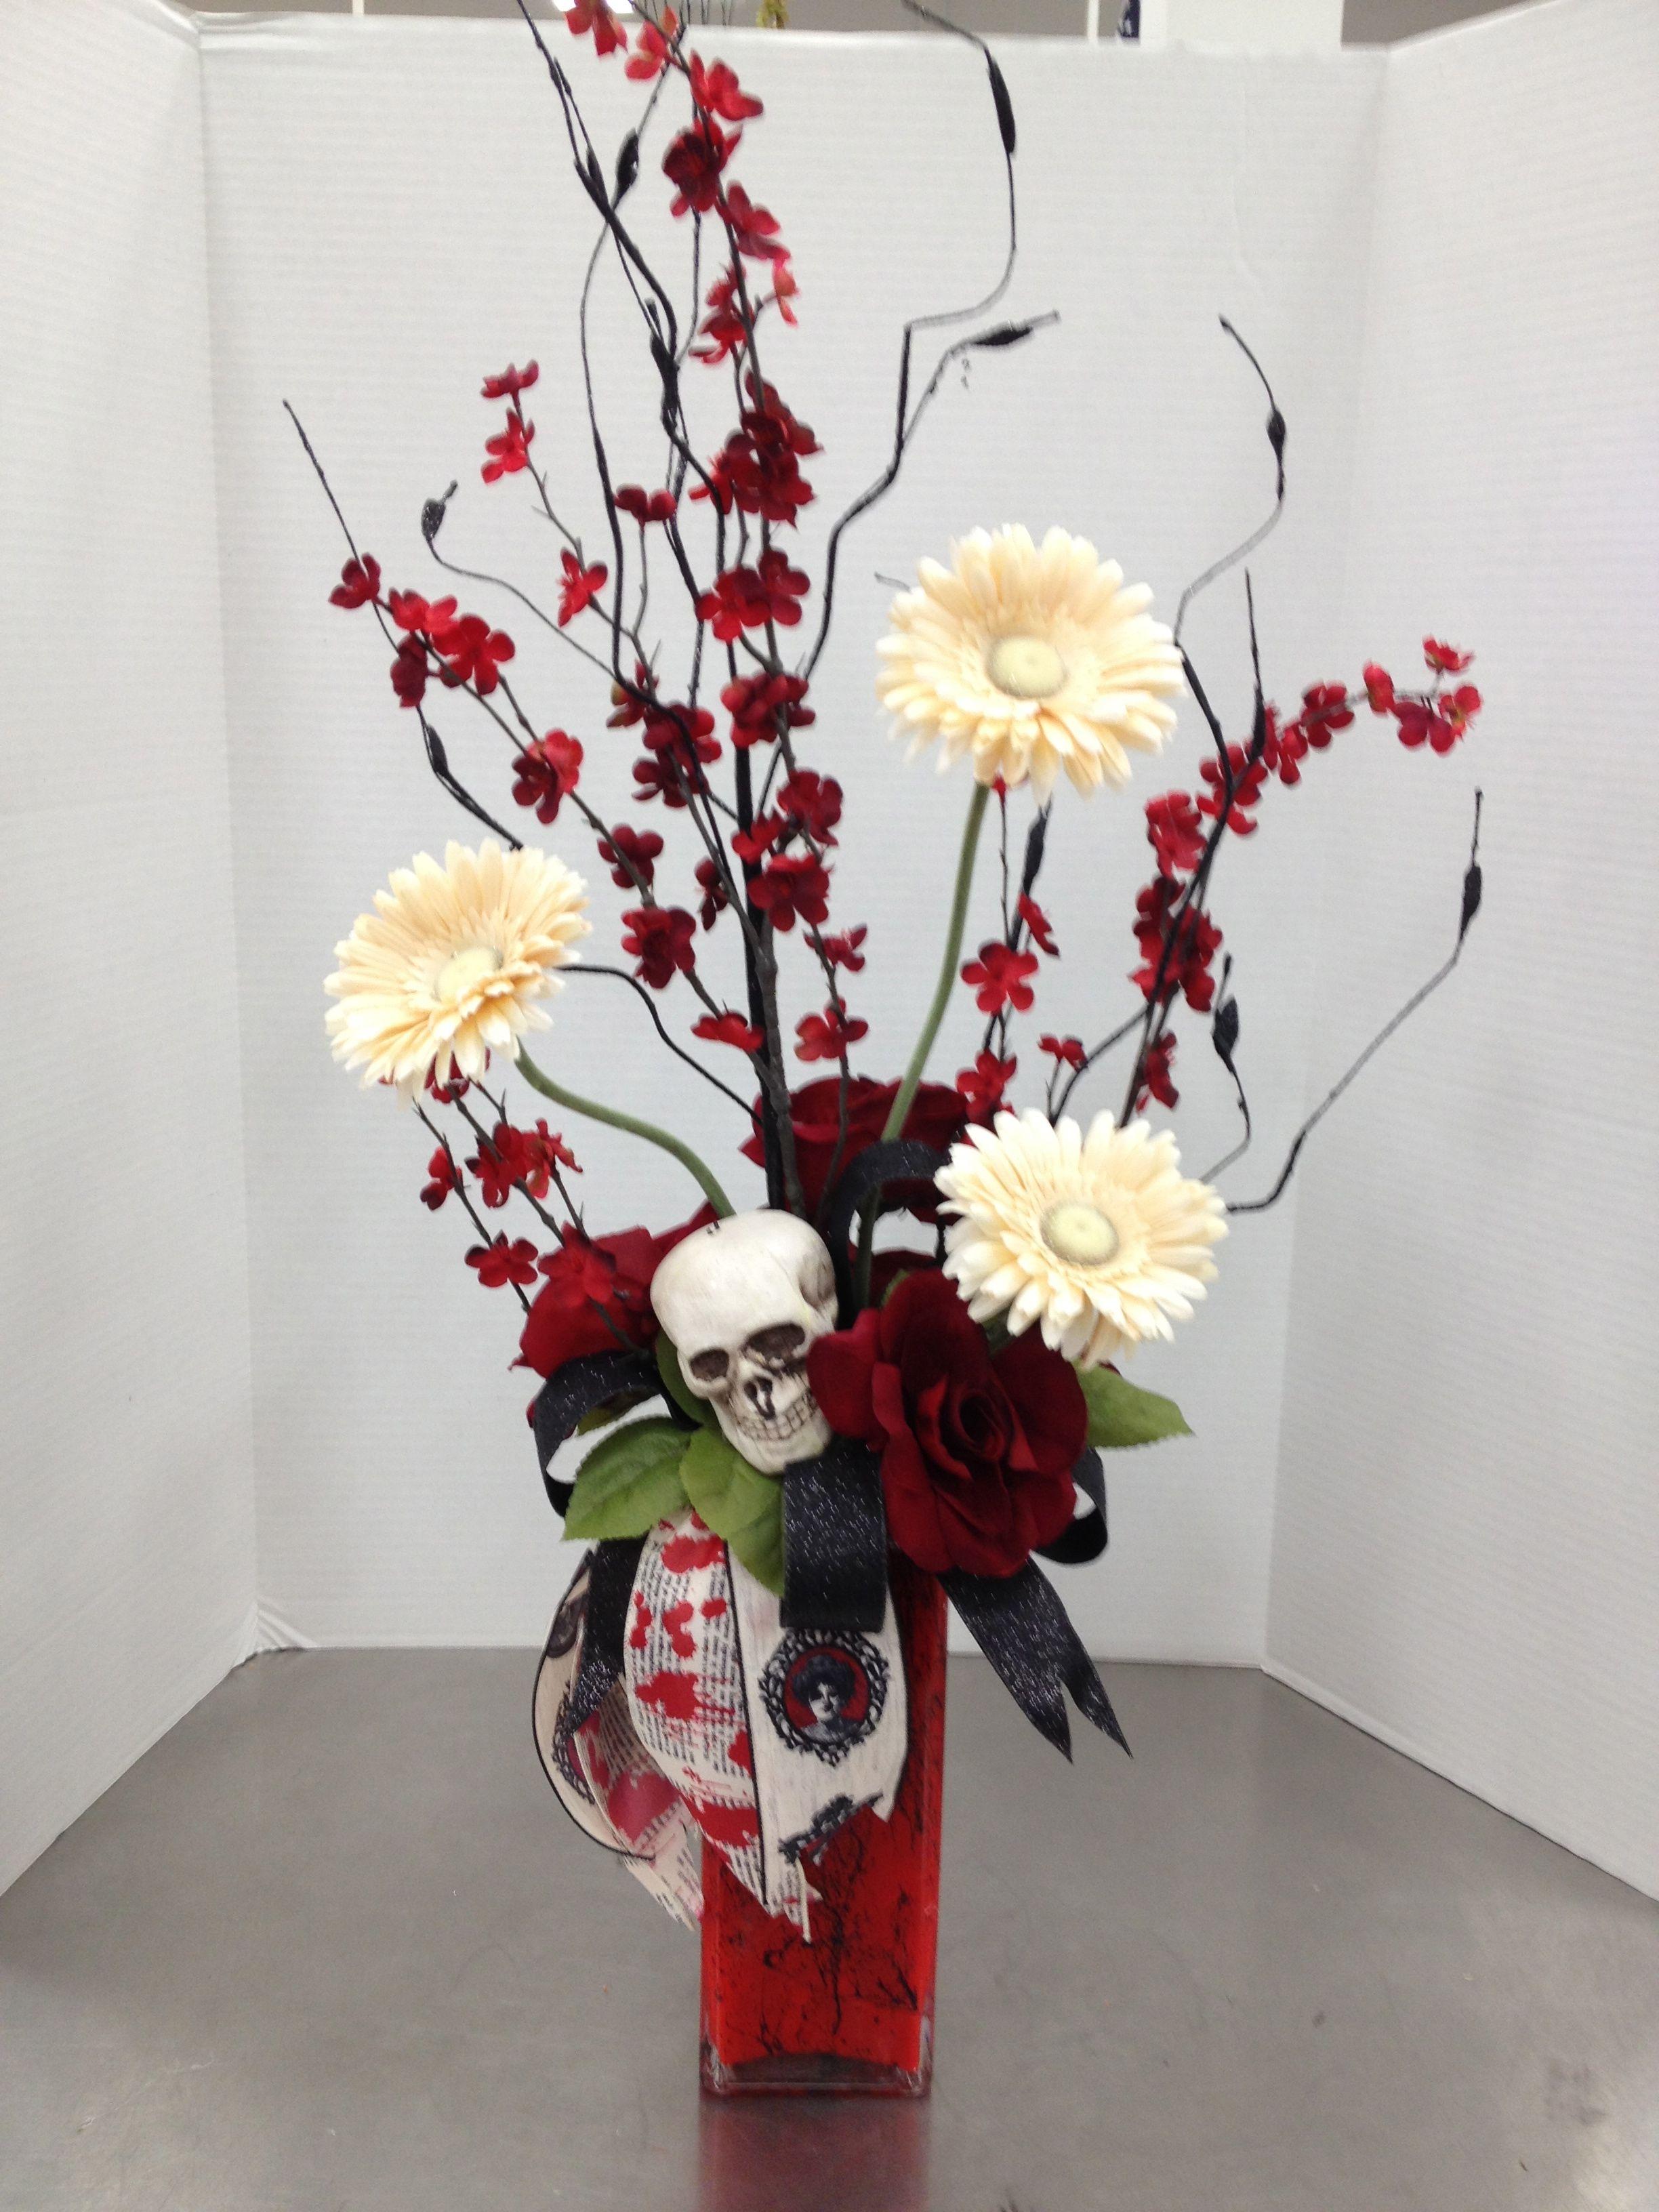 Finished arrangement in custom painted gl vase... Look at my ... on na flower, ca flower, va flower, vi flower, ls flower, dz flower, pa flower, ve flower, mn flower, uk flower, sd flower, sc flower,